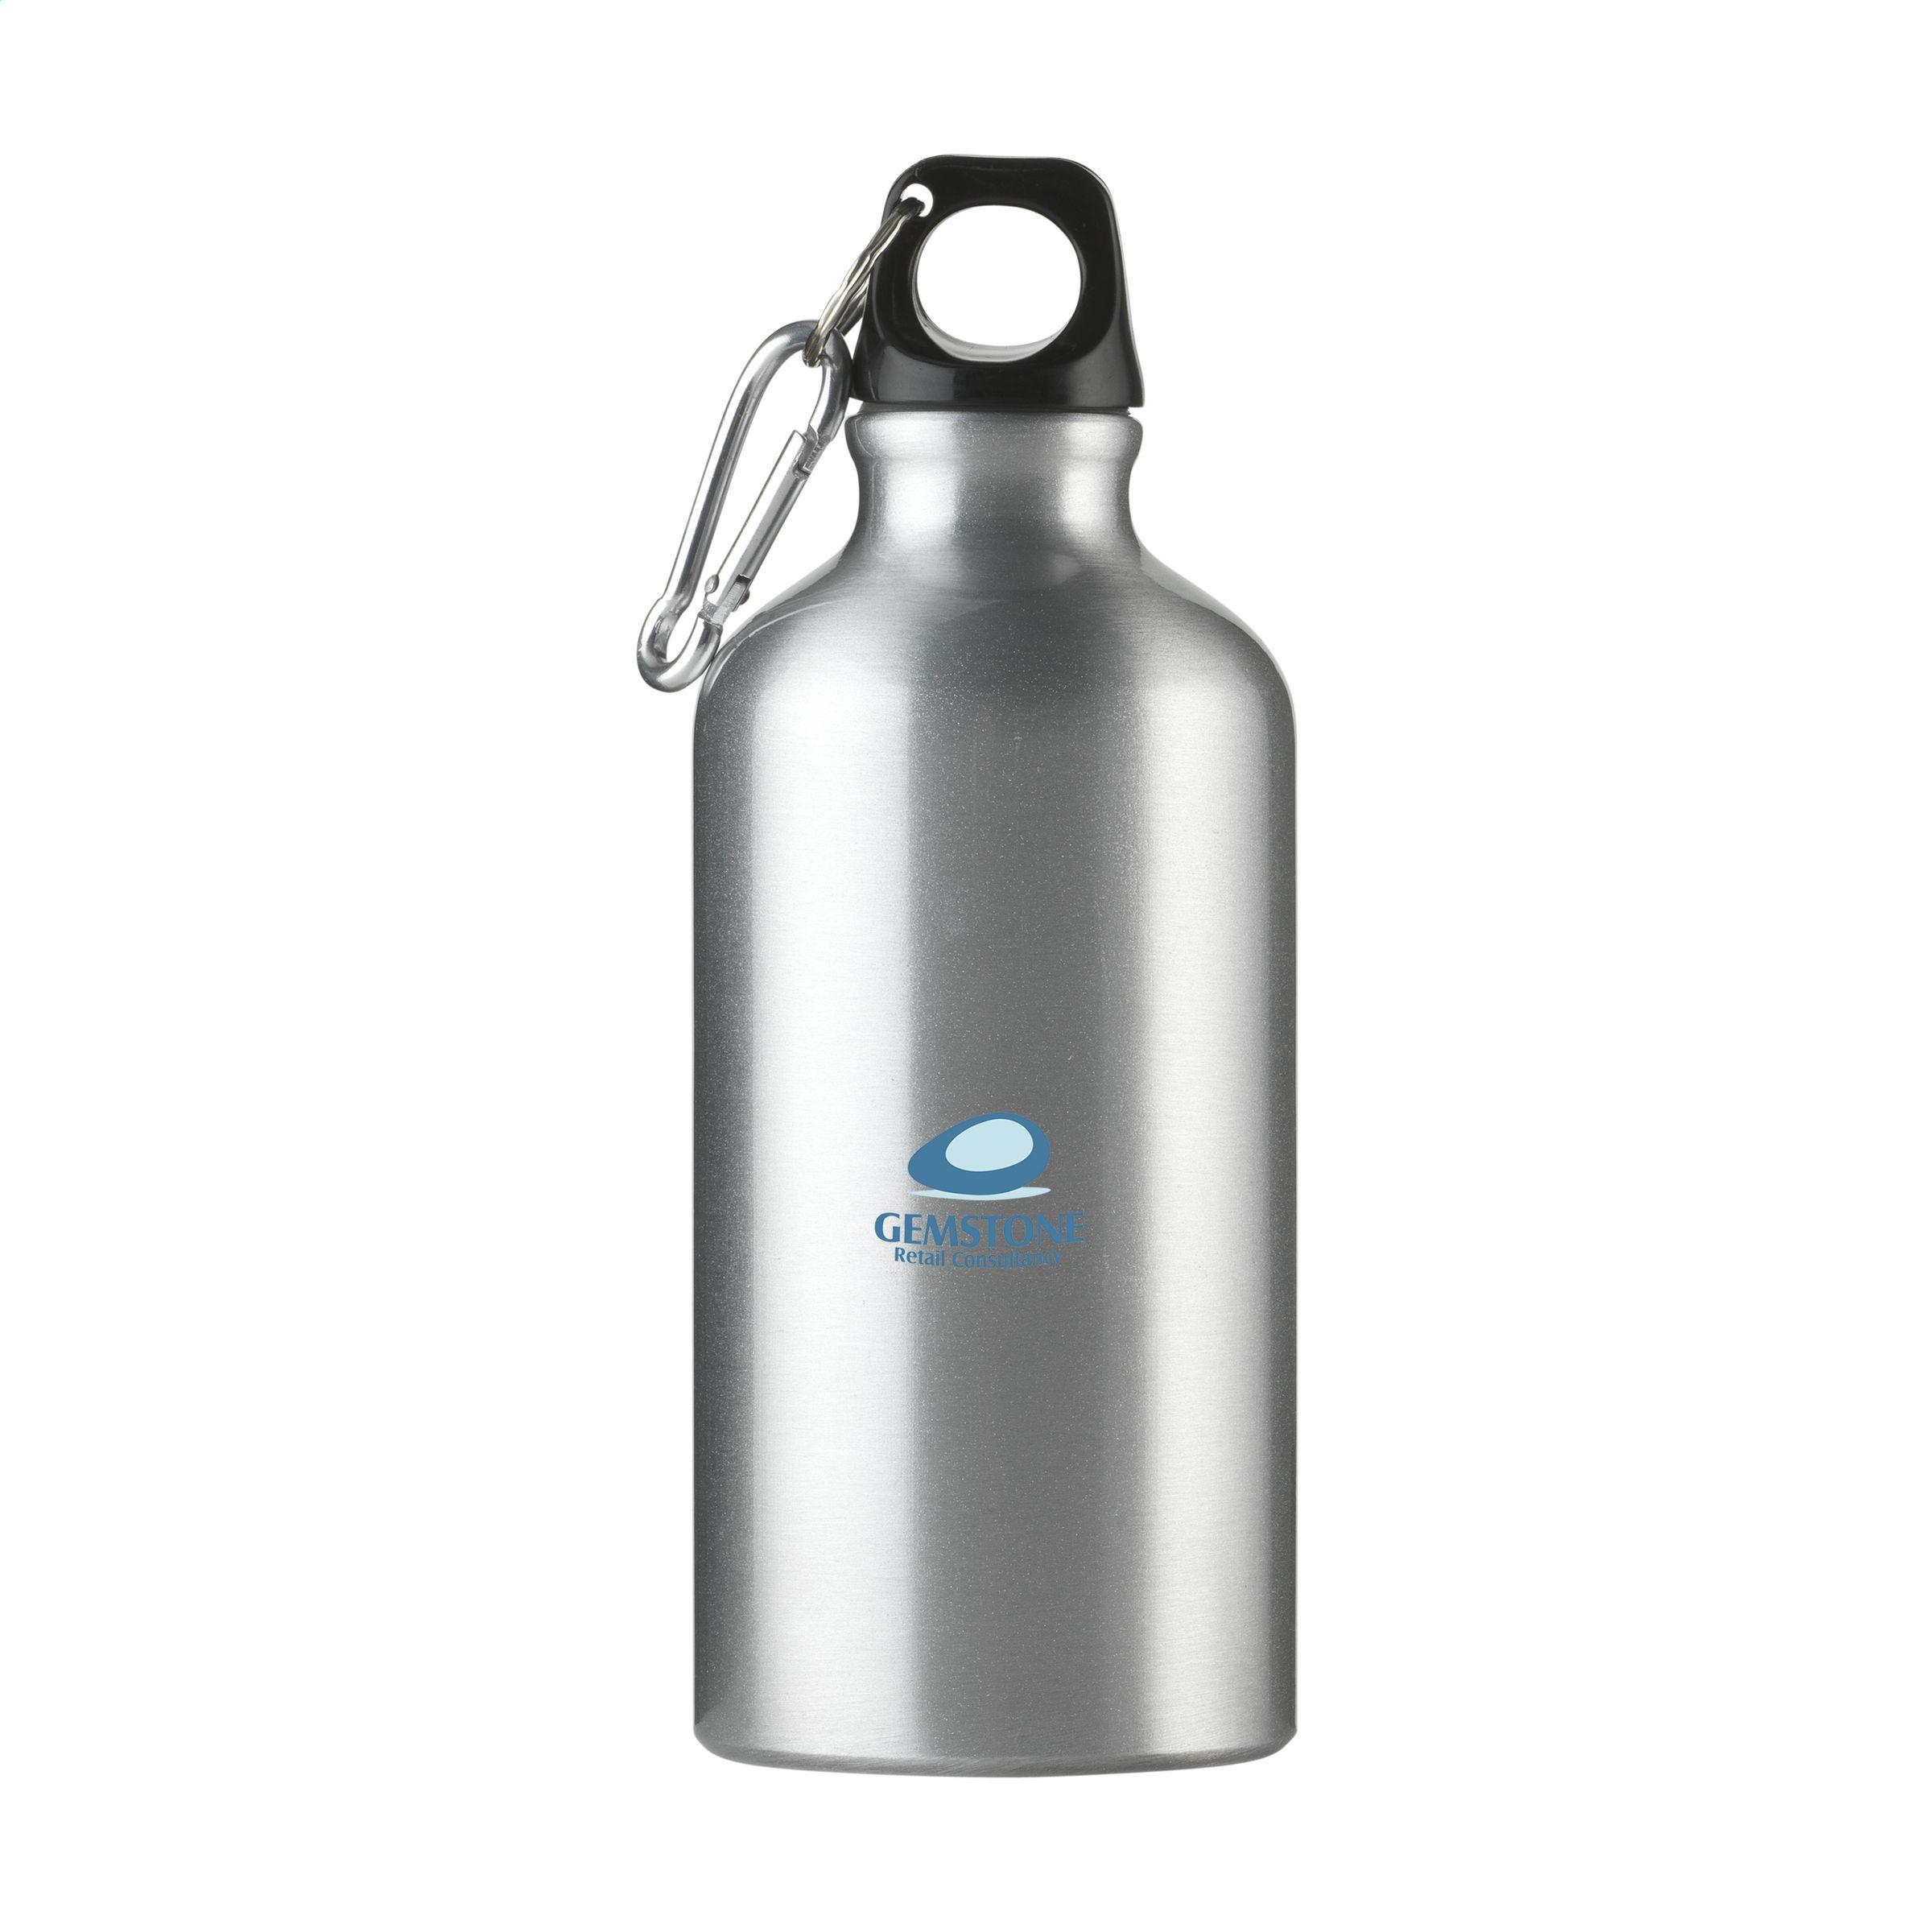 AquaBottle Water bottle printing